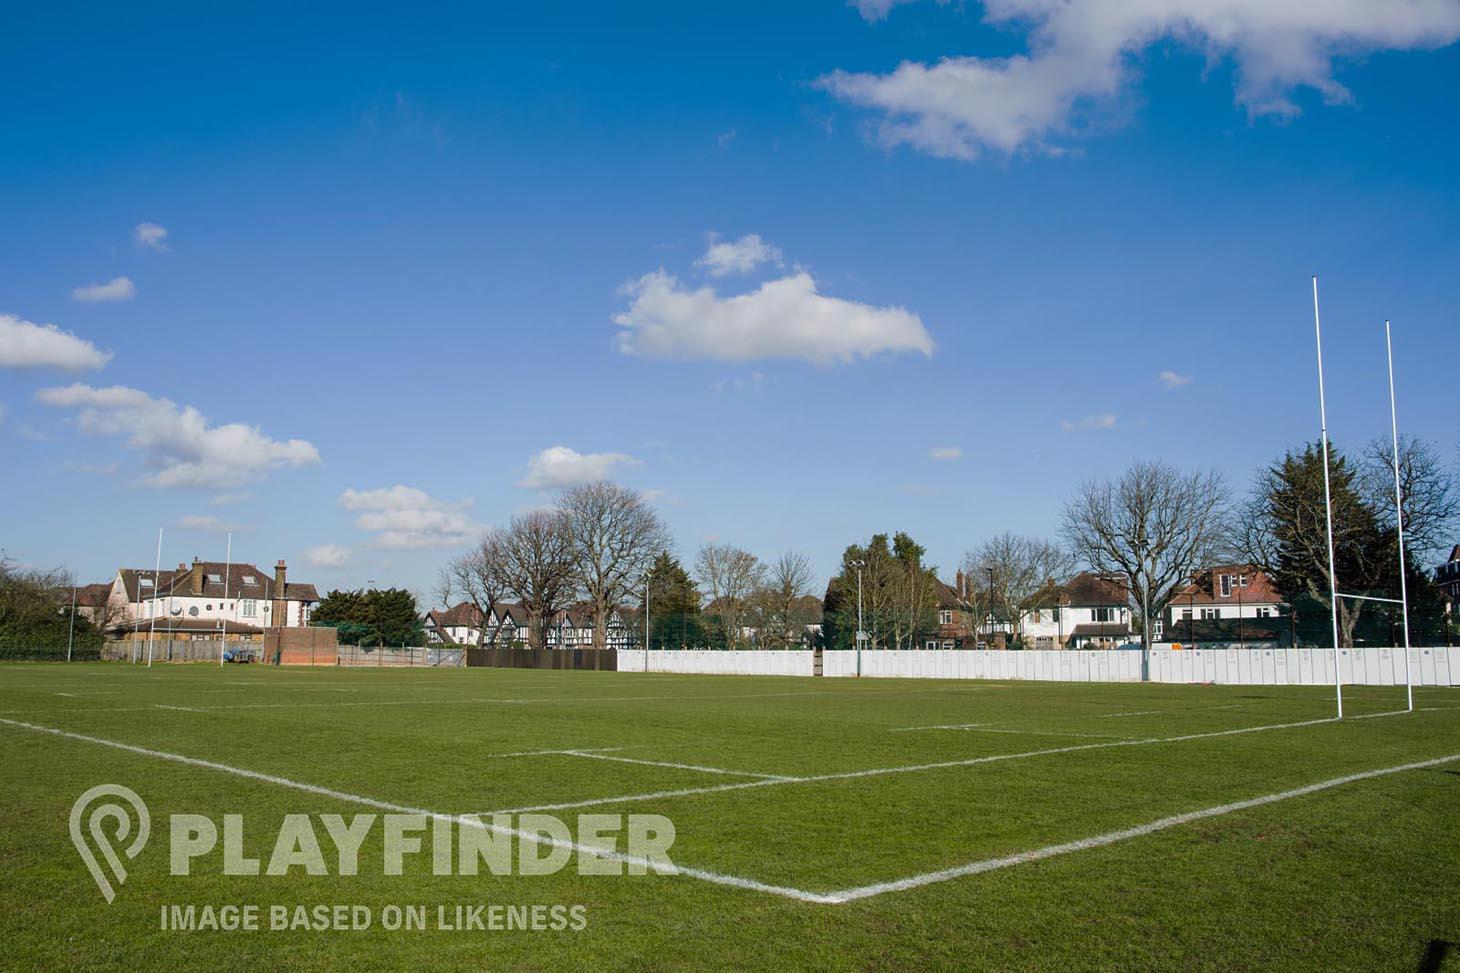 Railway Union Sports Club Union rugby pitch